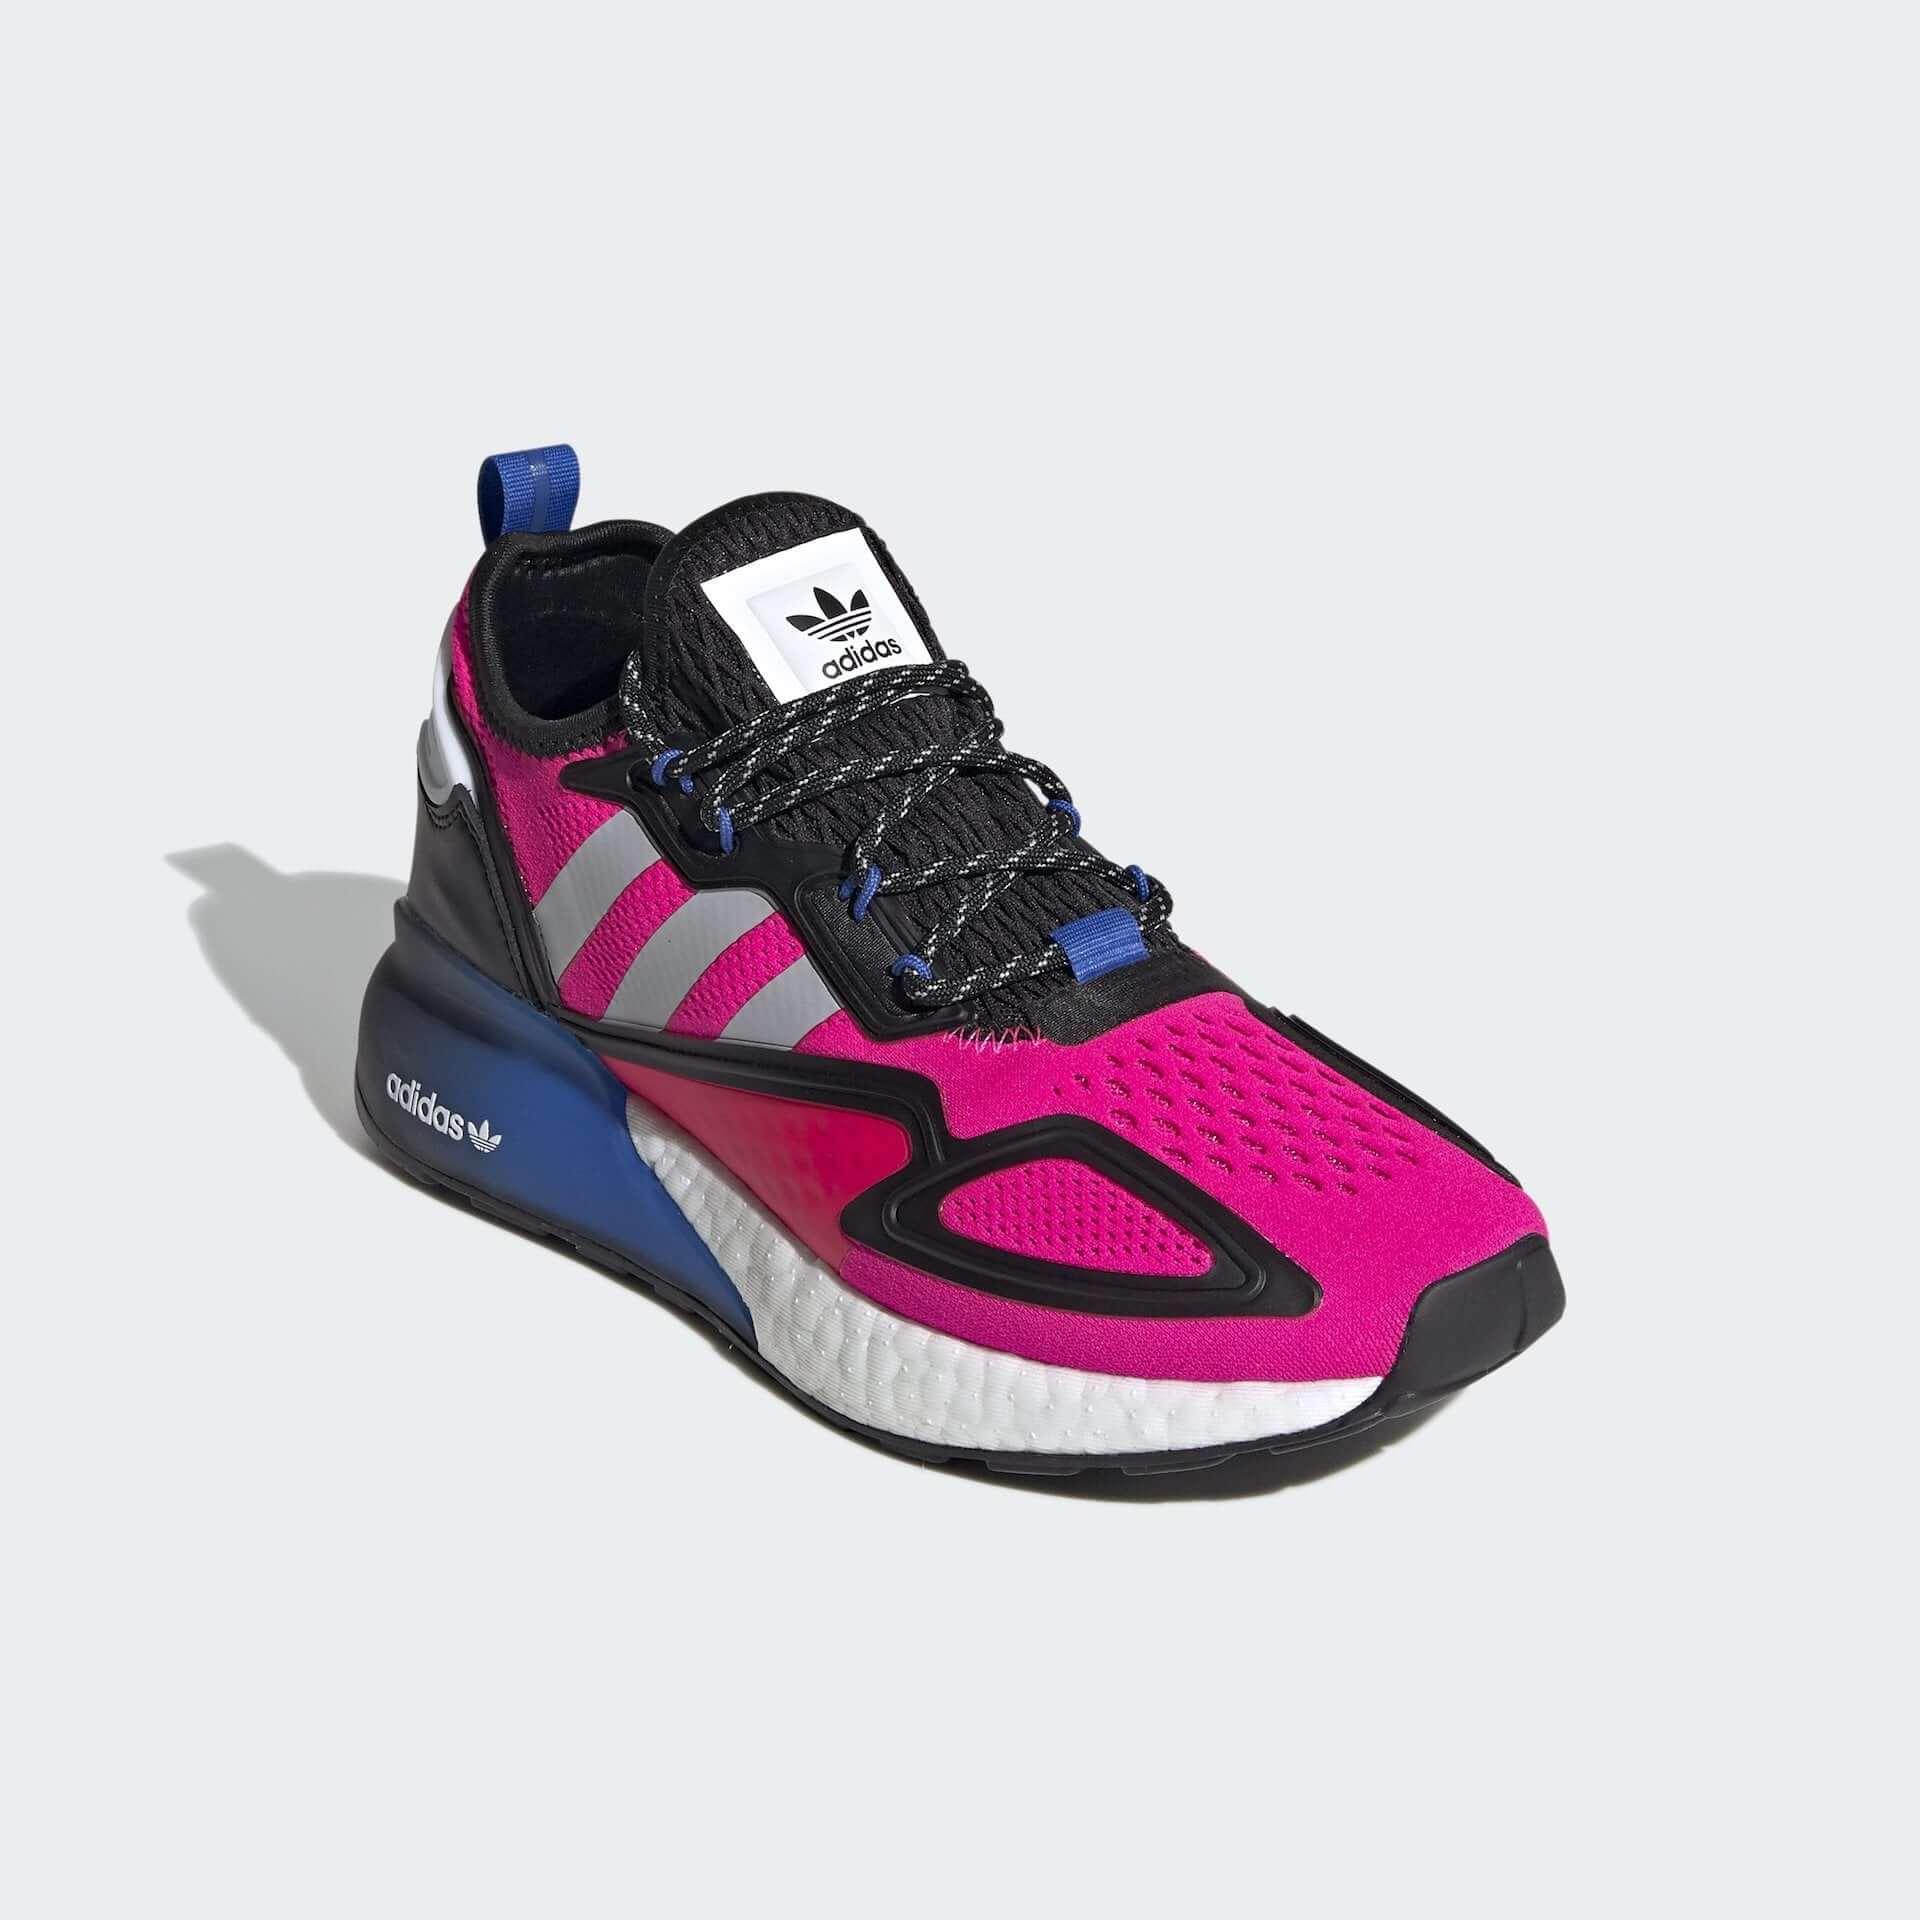 adidas Originalsの「ZX」シリーズから最新モデル『ZX 2K BOOST』が登場!レイザーラモンRG、アントニー出演のIGライブも開催決定 lf200817_adidas-zx_8-1920x1920